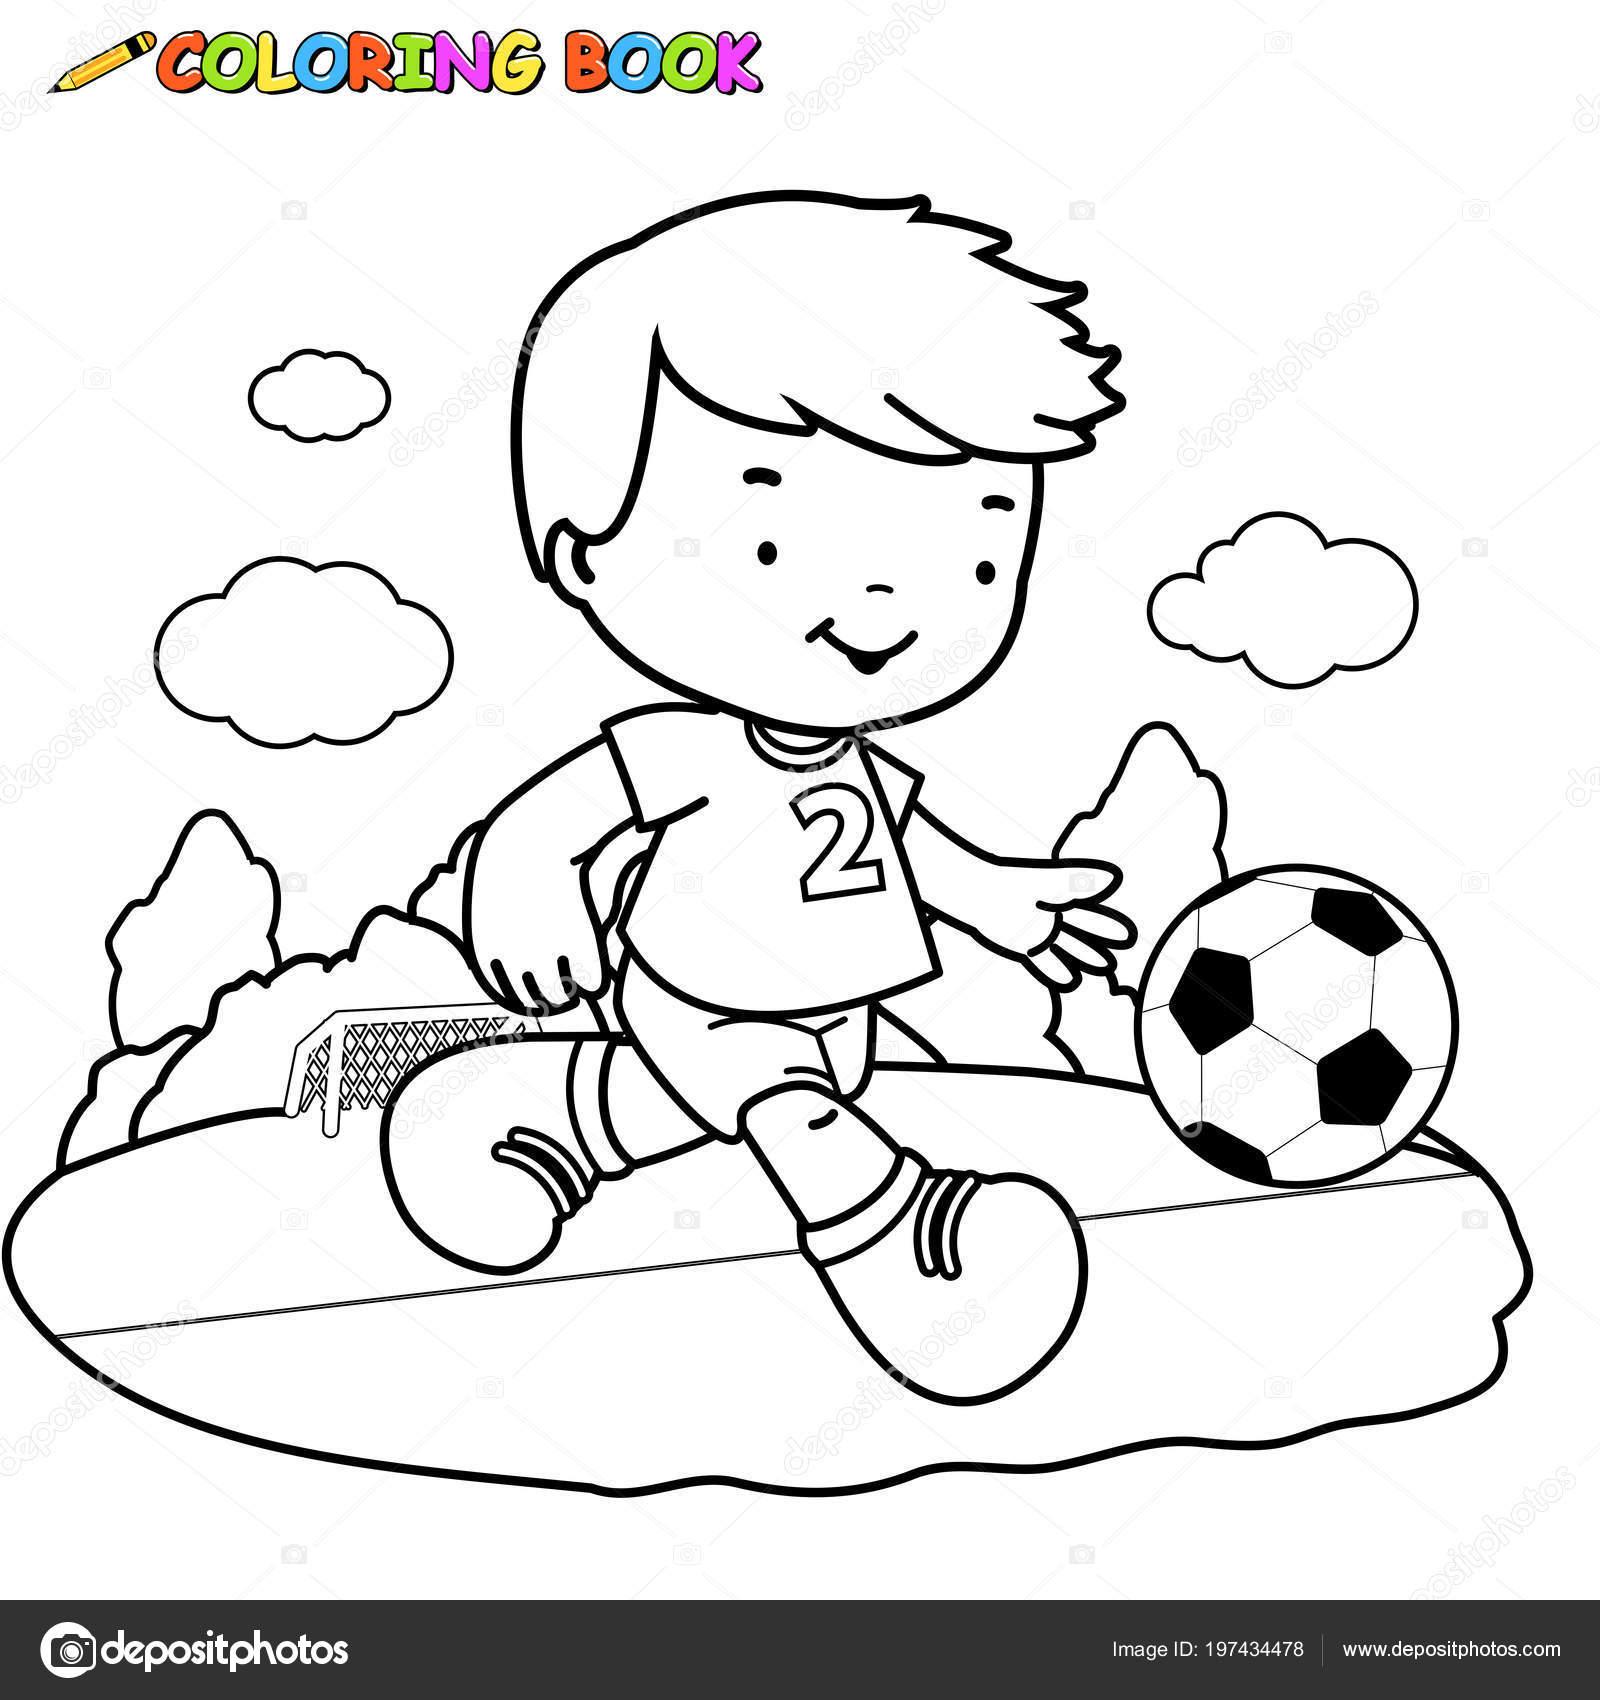 Siyah Beyaz Anahat Futbol Oynayan Bir çocuk Imajının Boyama Kitabı